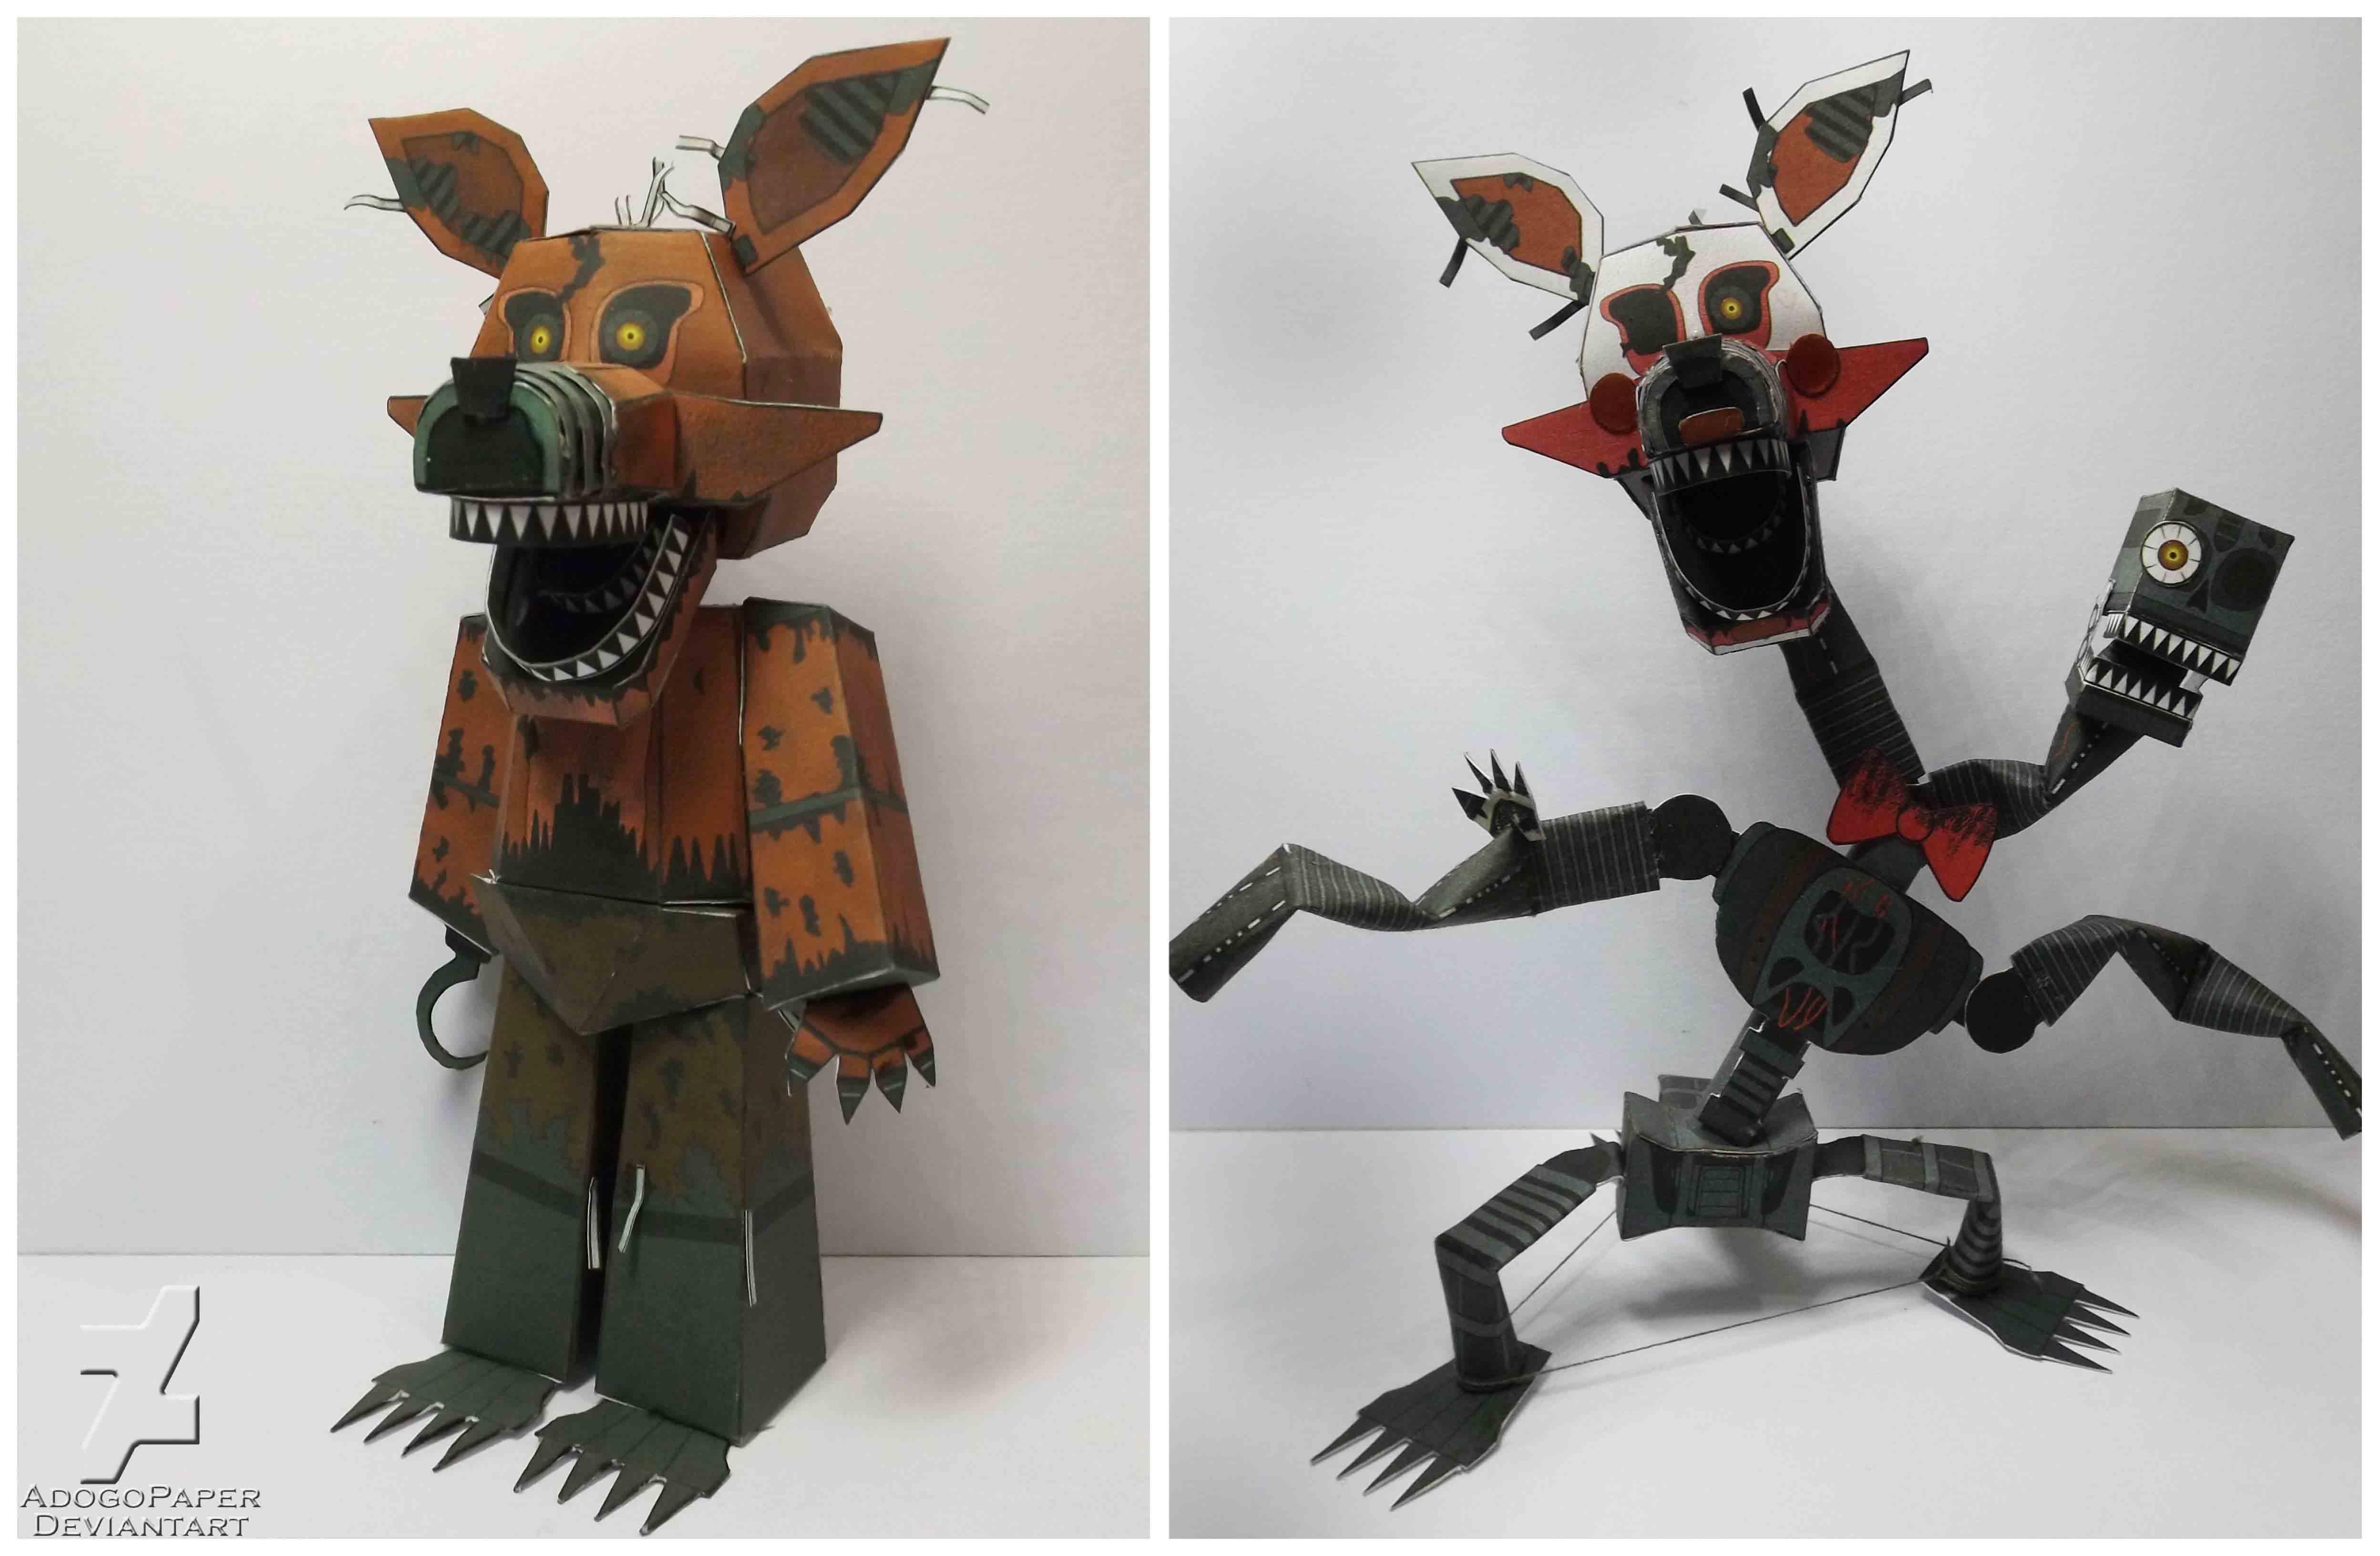 FNAF 4 Nightmare Foxy/Mangle papercraft by Adogopaper on DeviantArt